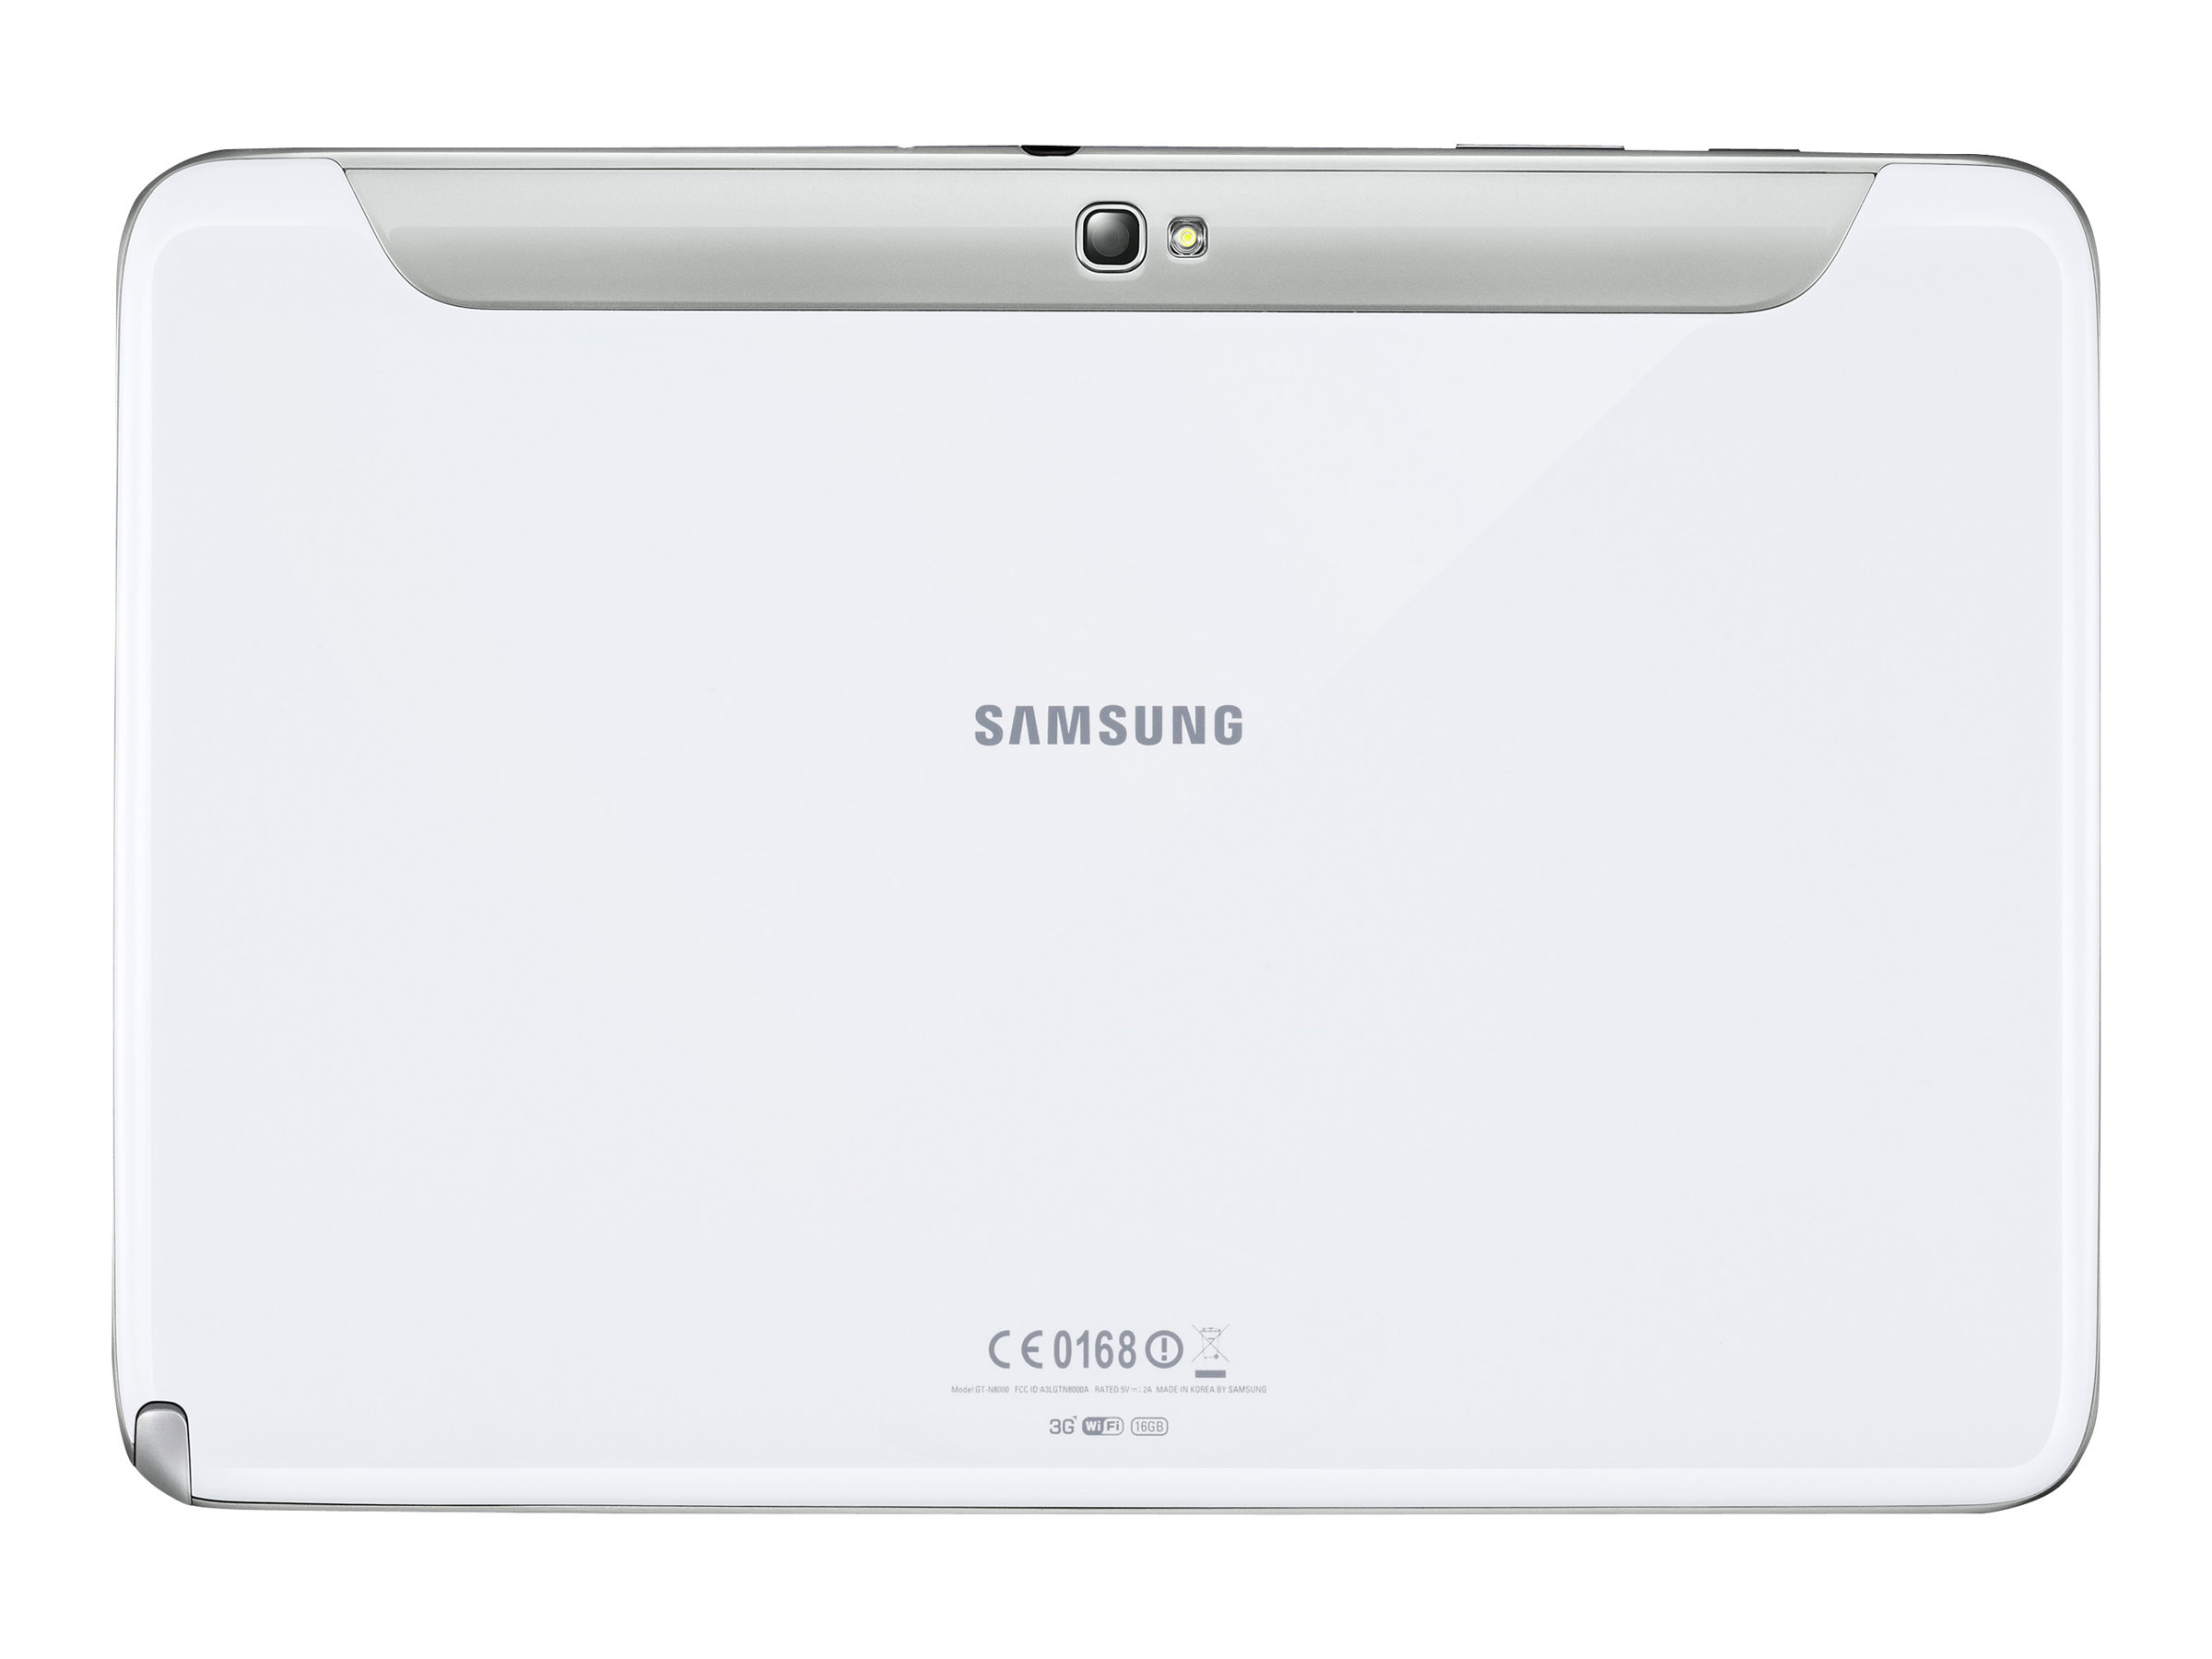 Samsung Galaxy Note 10.1 Tablet 2014 Edition SM-P6000ZWVXAR White 32GB